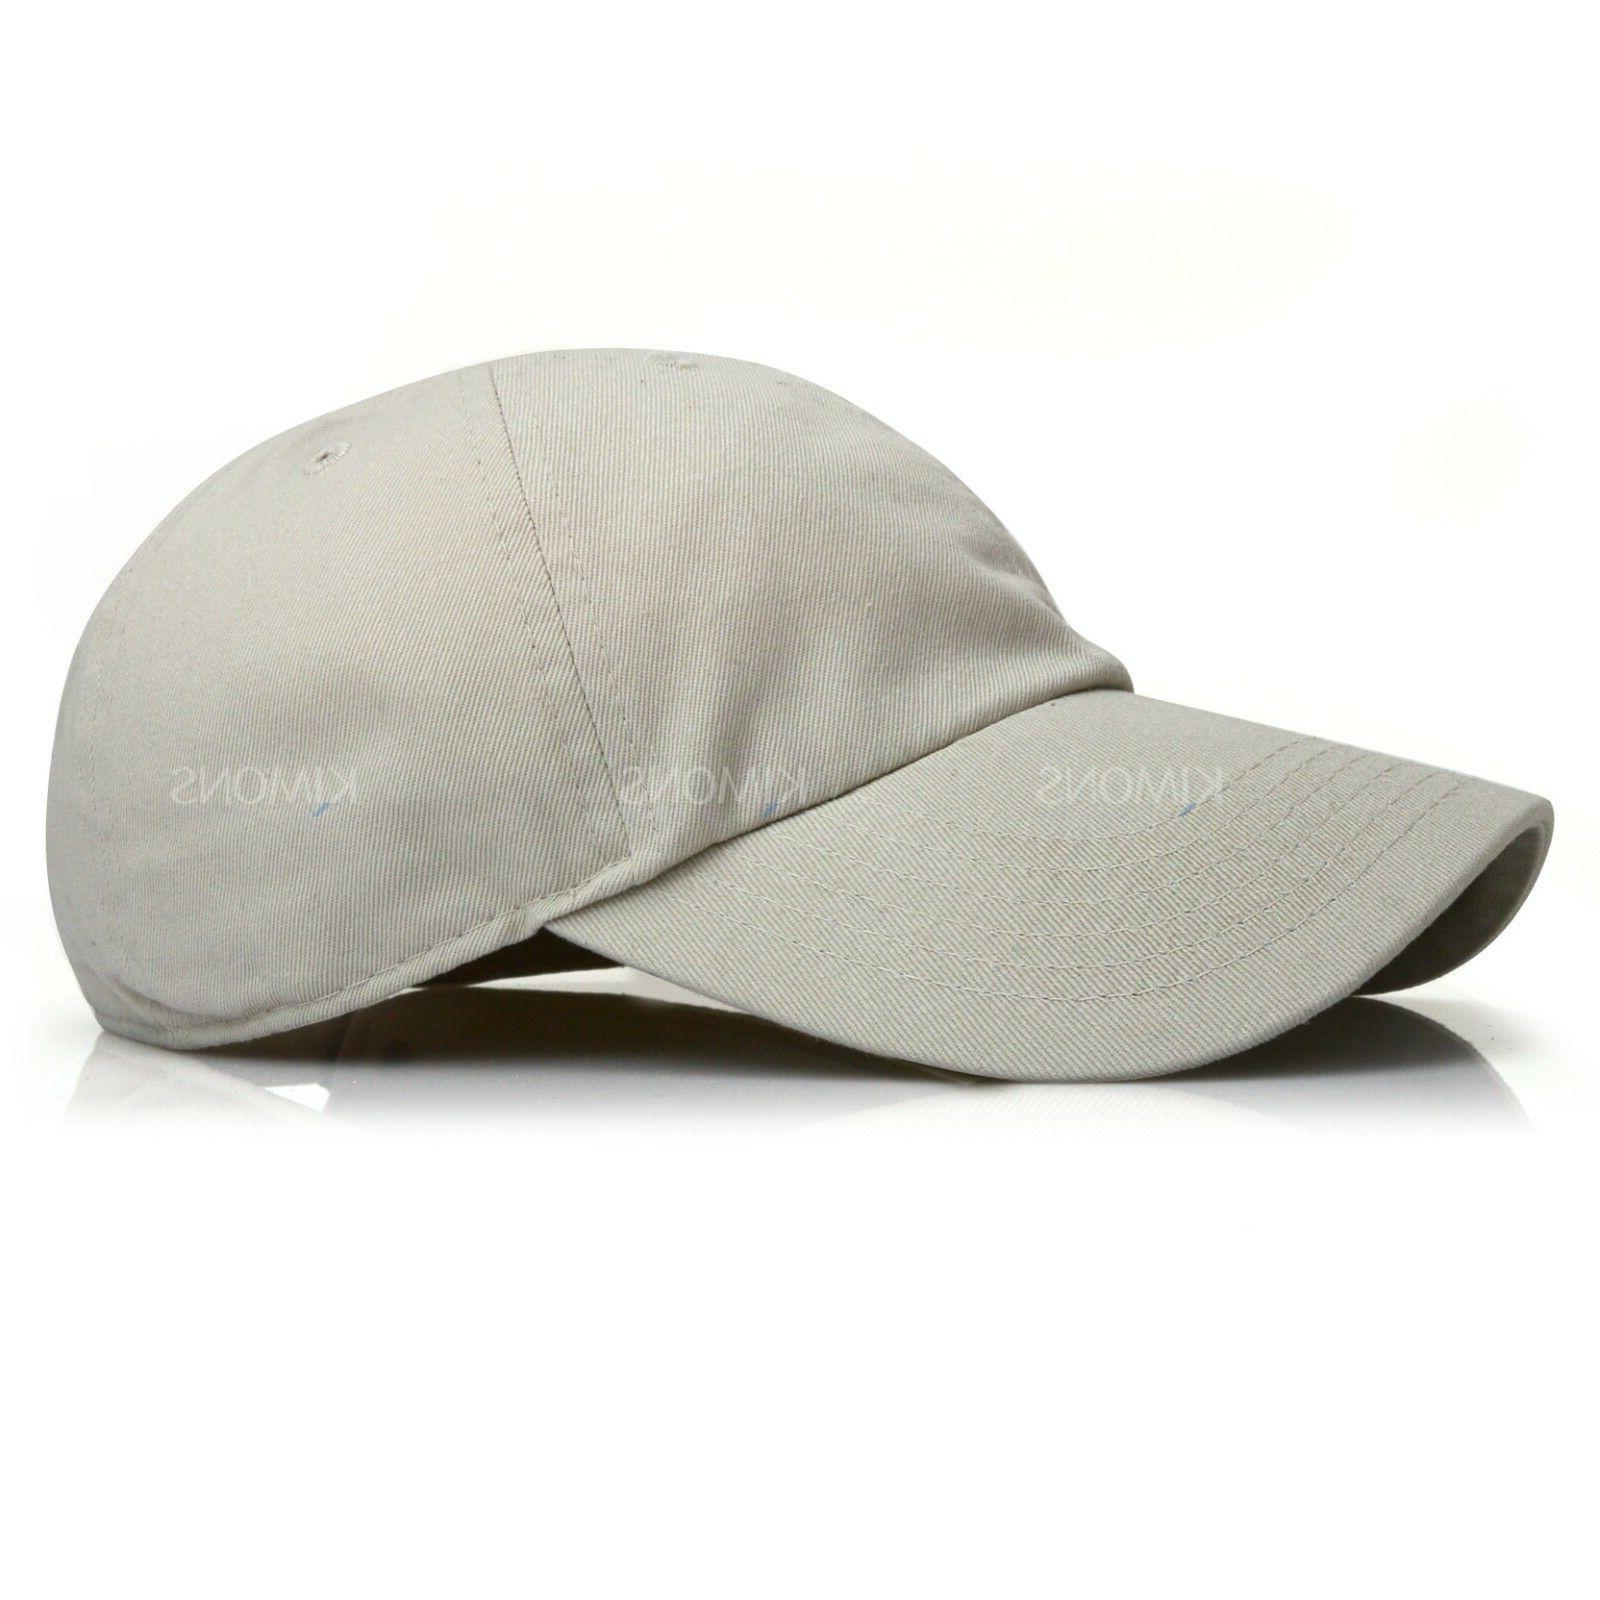 Polo Cotton Cap Adjustable Mens